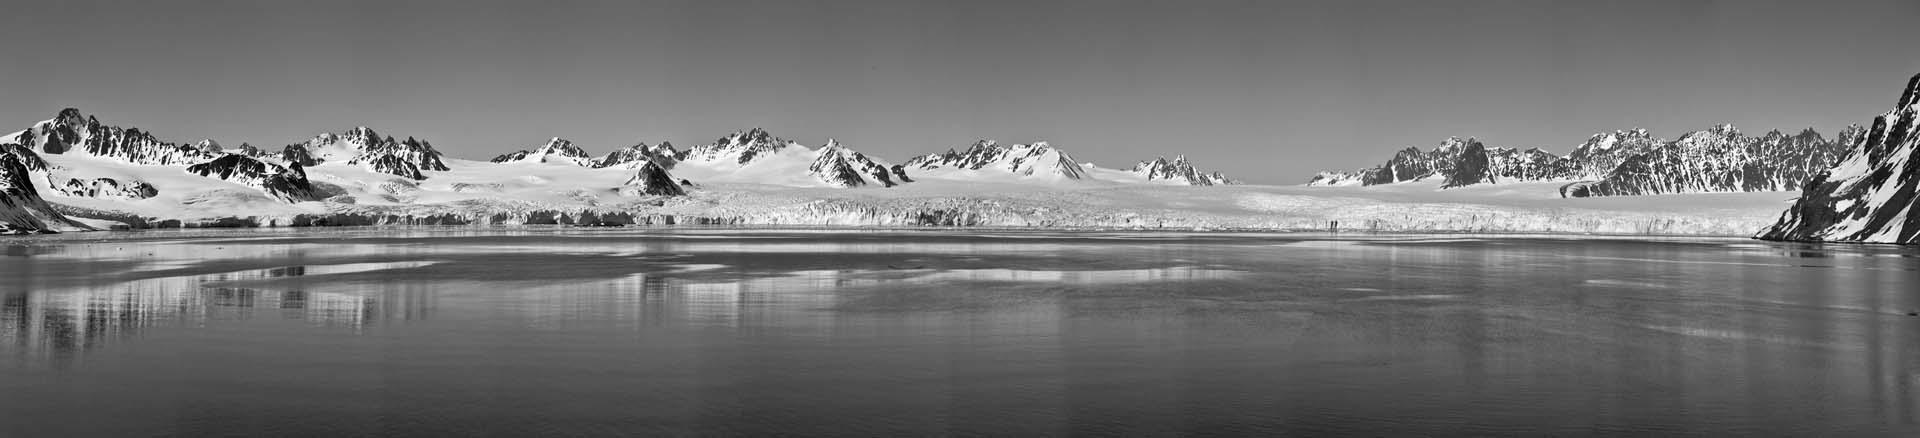 lilliehook_glacier_224a9292-224a9306_201